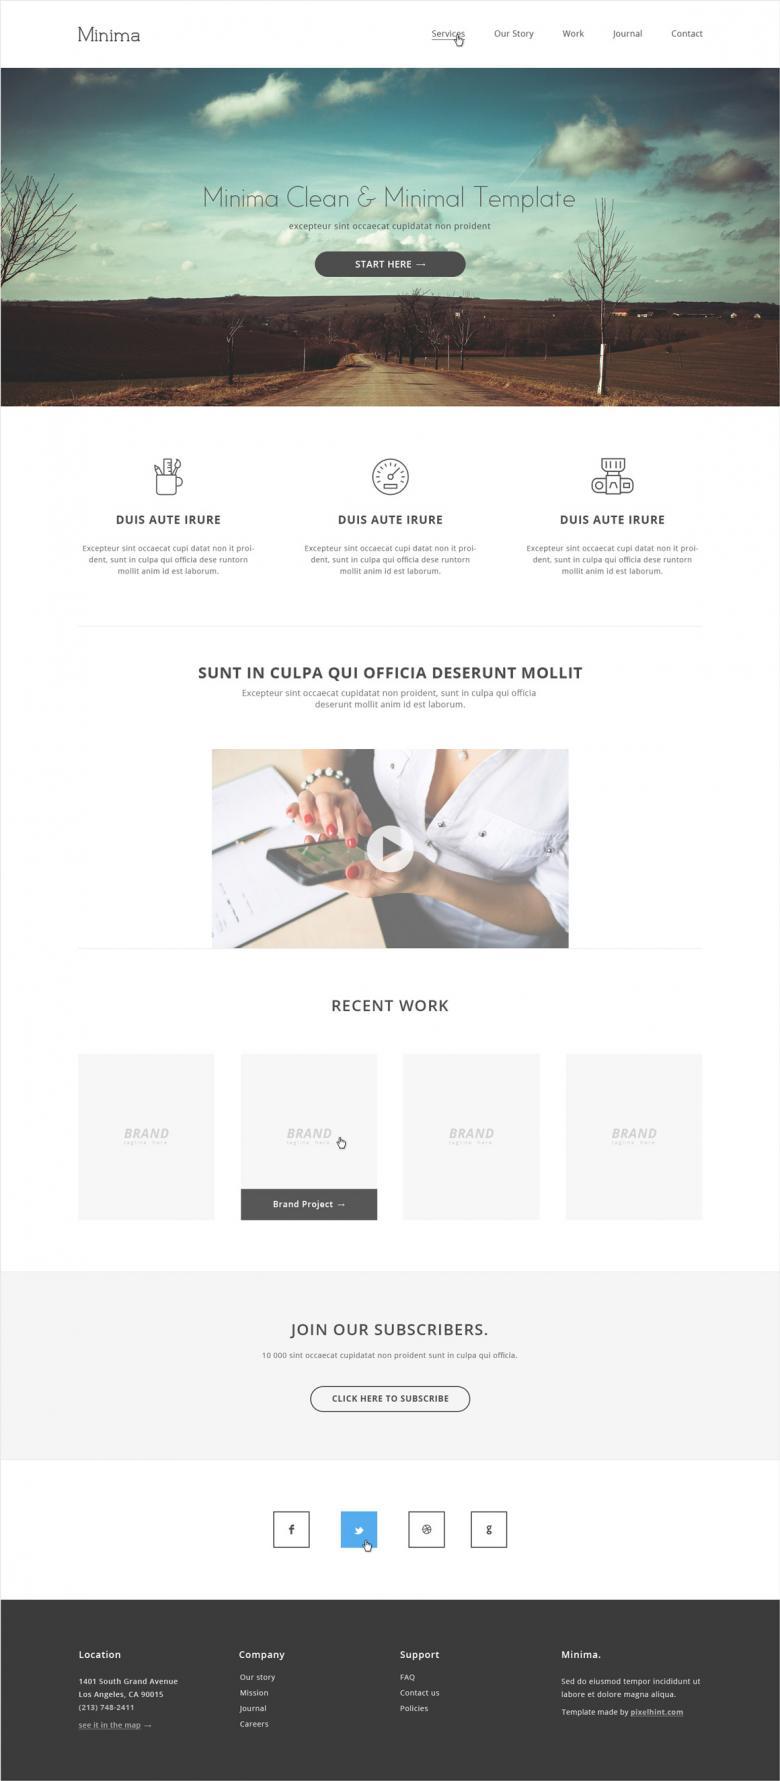 Minima minimalist HTML5/CSS3 template